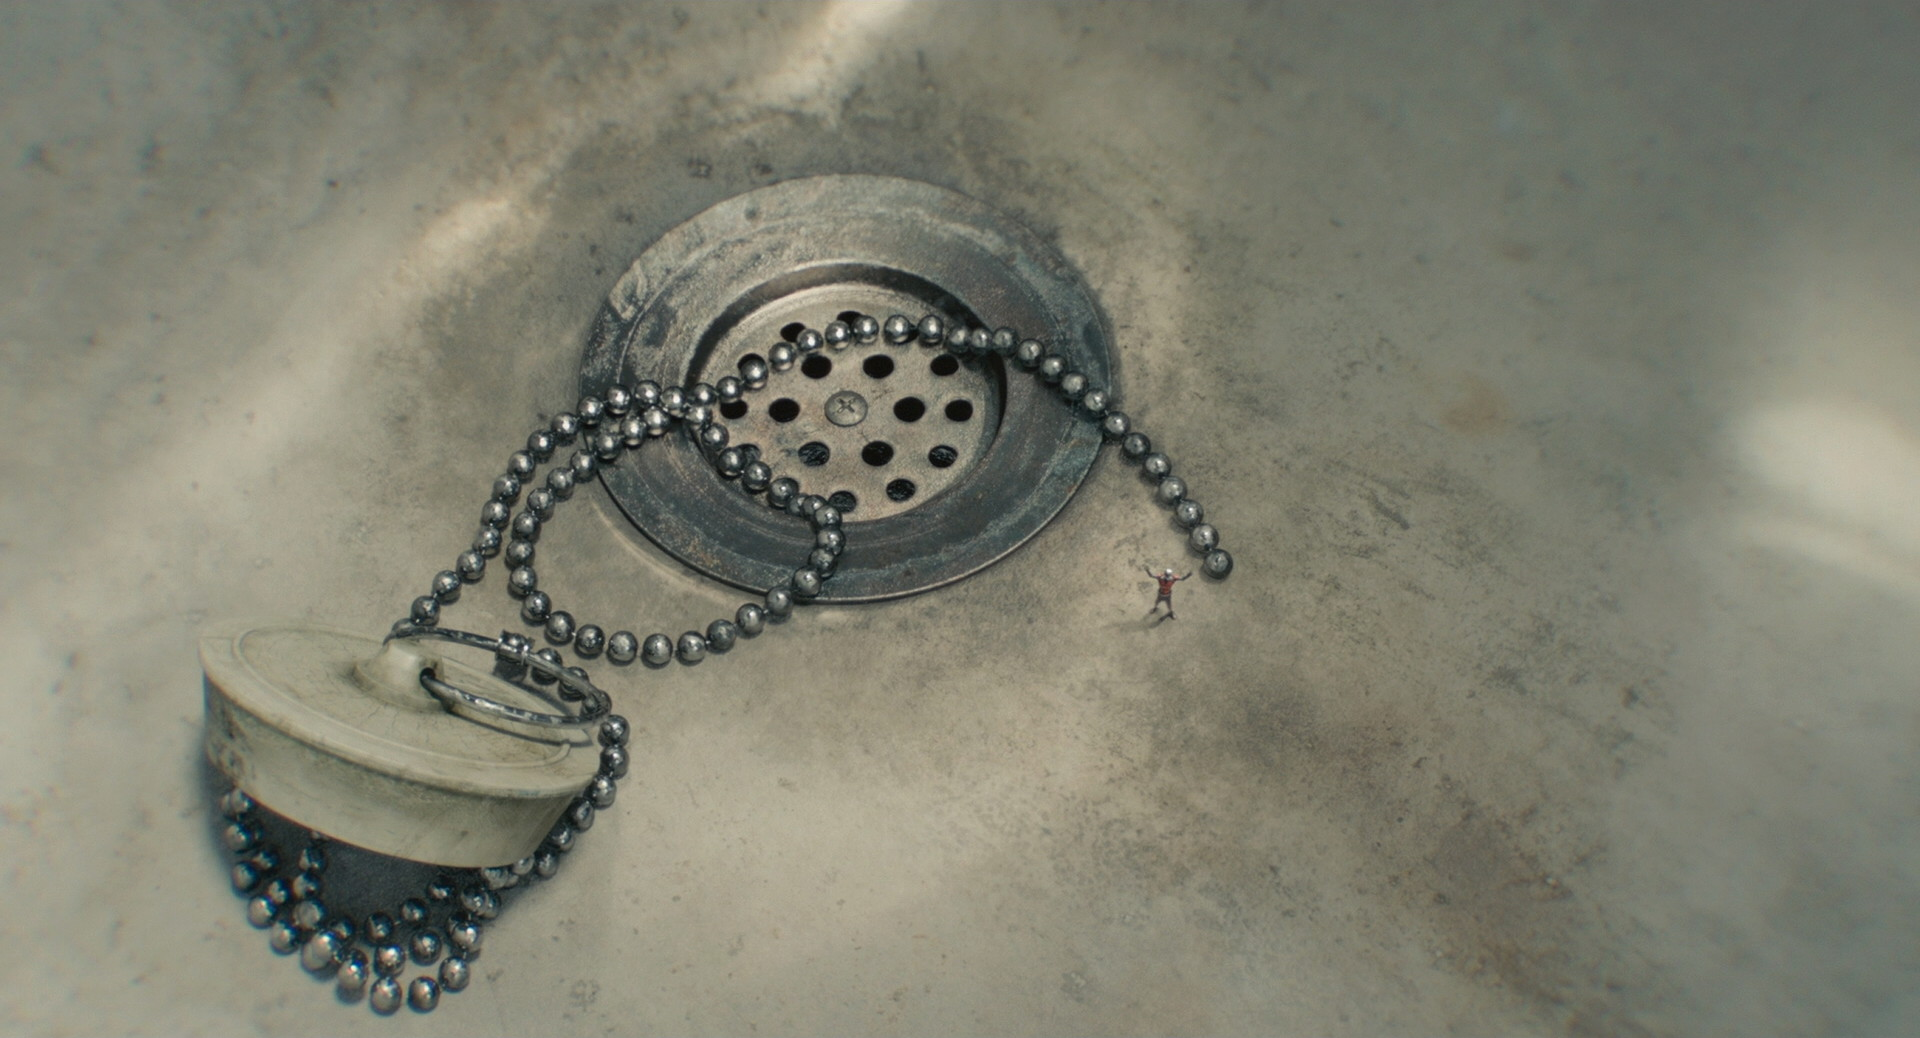 Saby menyhei antman bathtub003